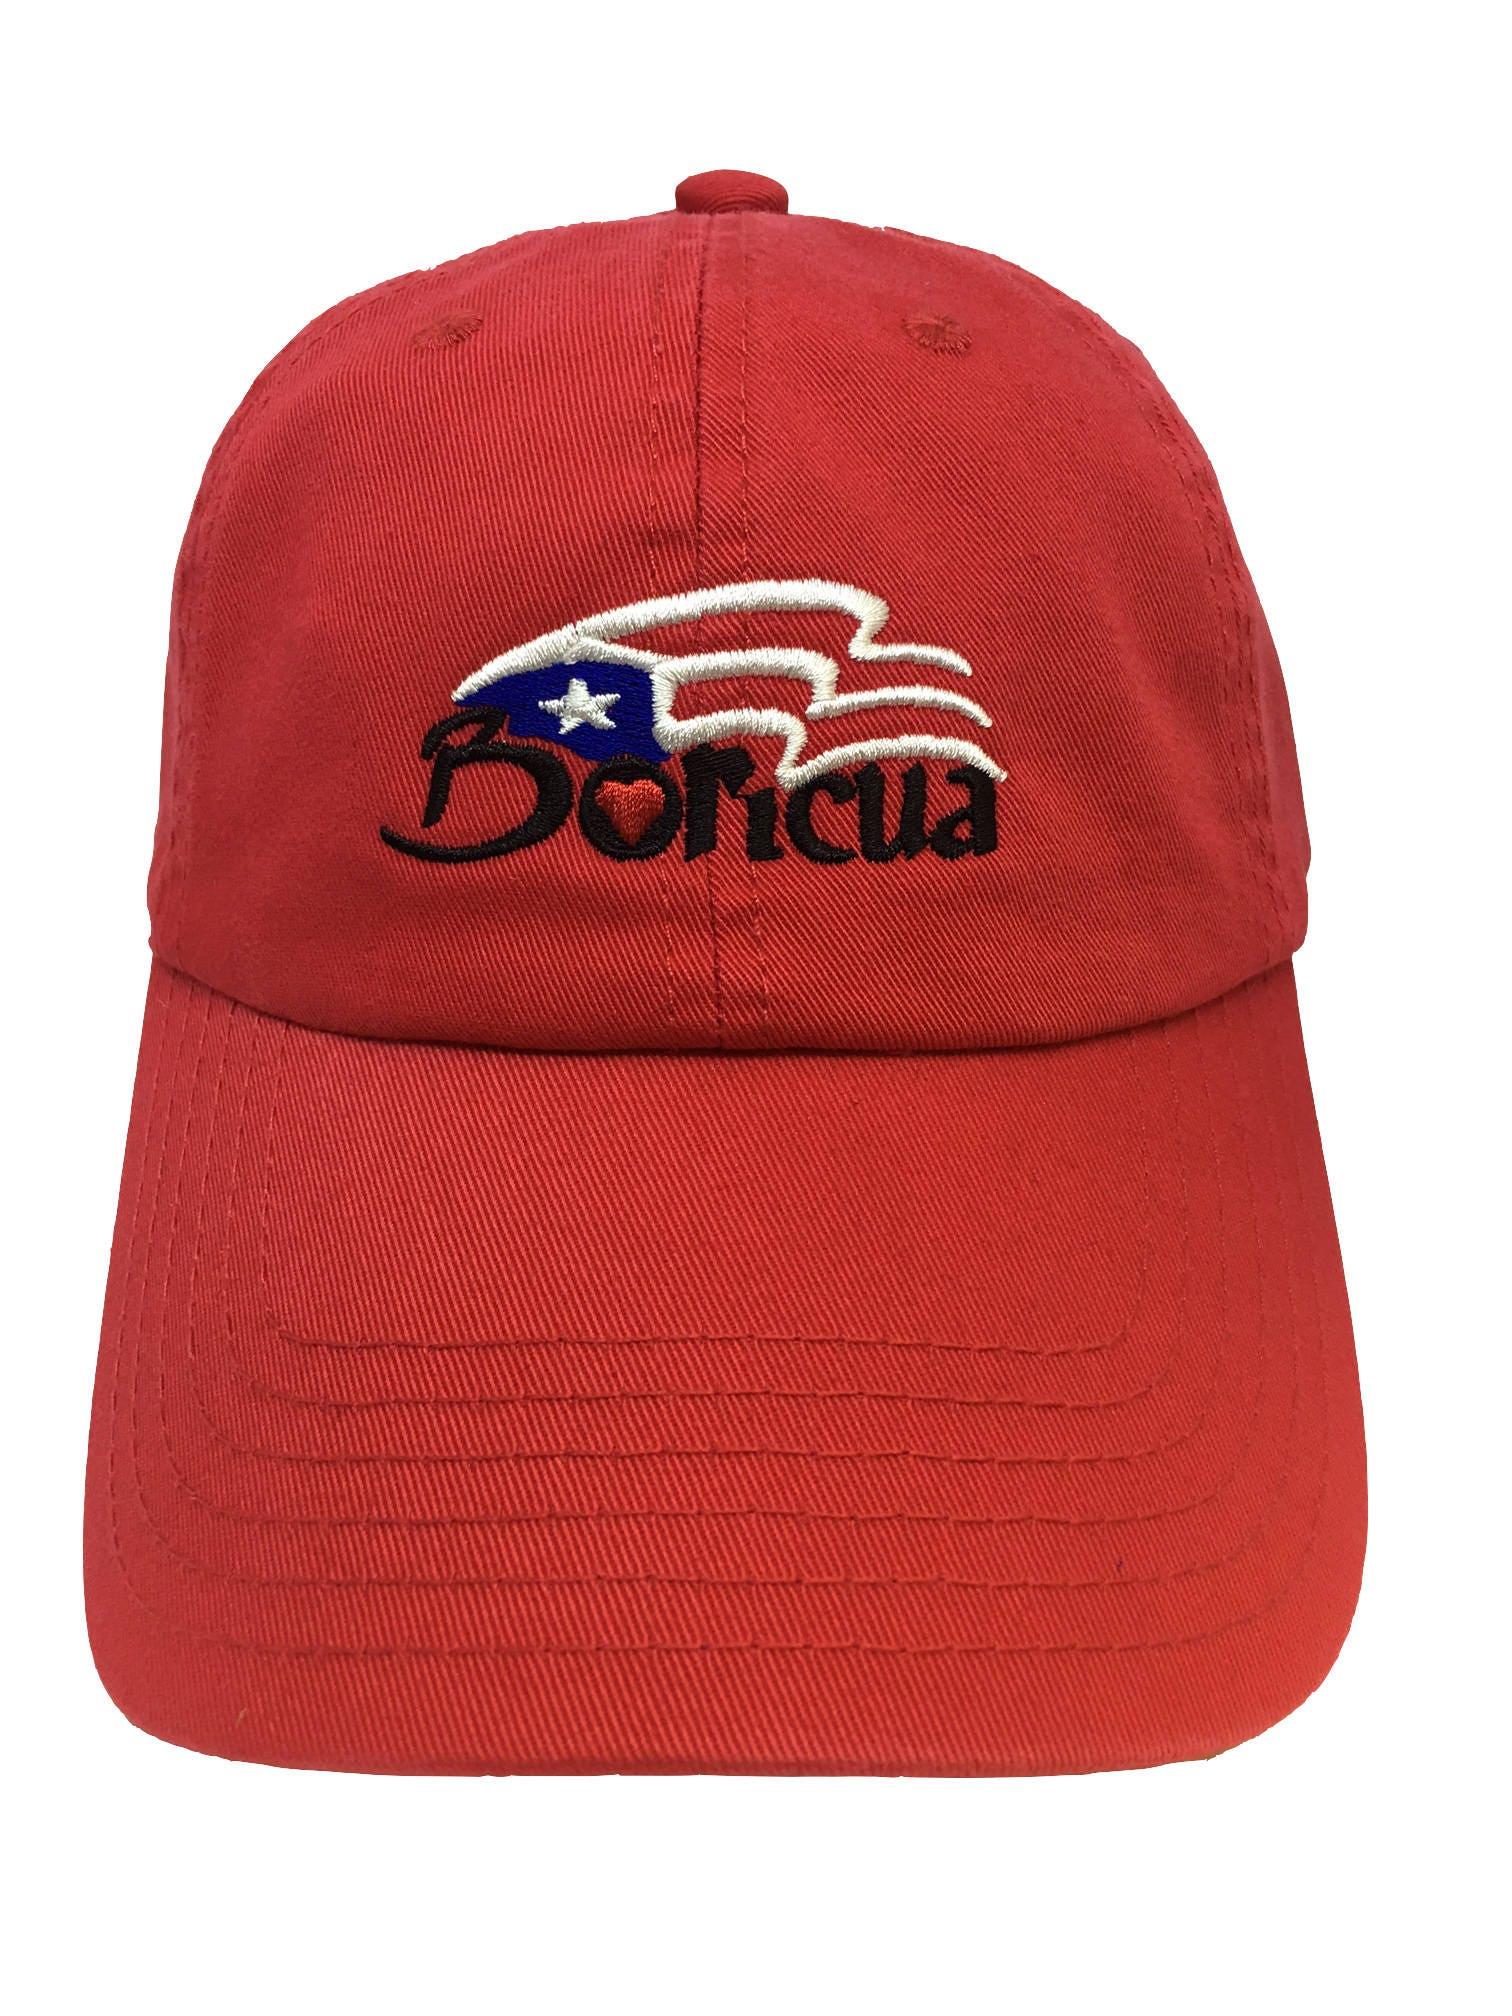 Boricua Puerto Rico Flag Red Adjustable Strapback Cap Dad Hat  d7808f703738